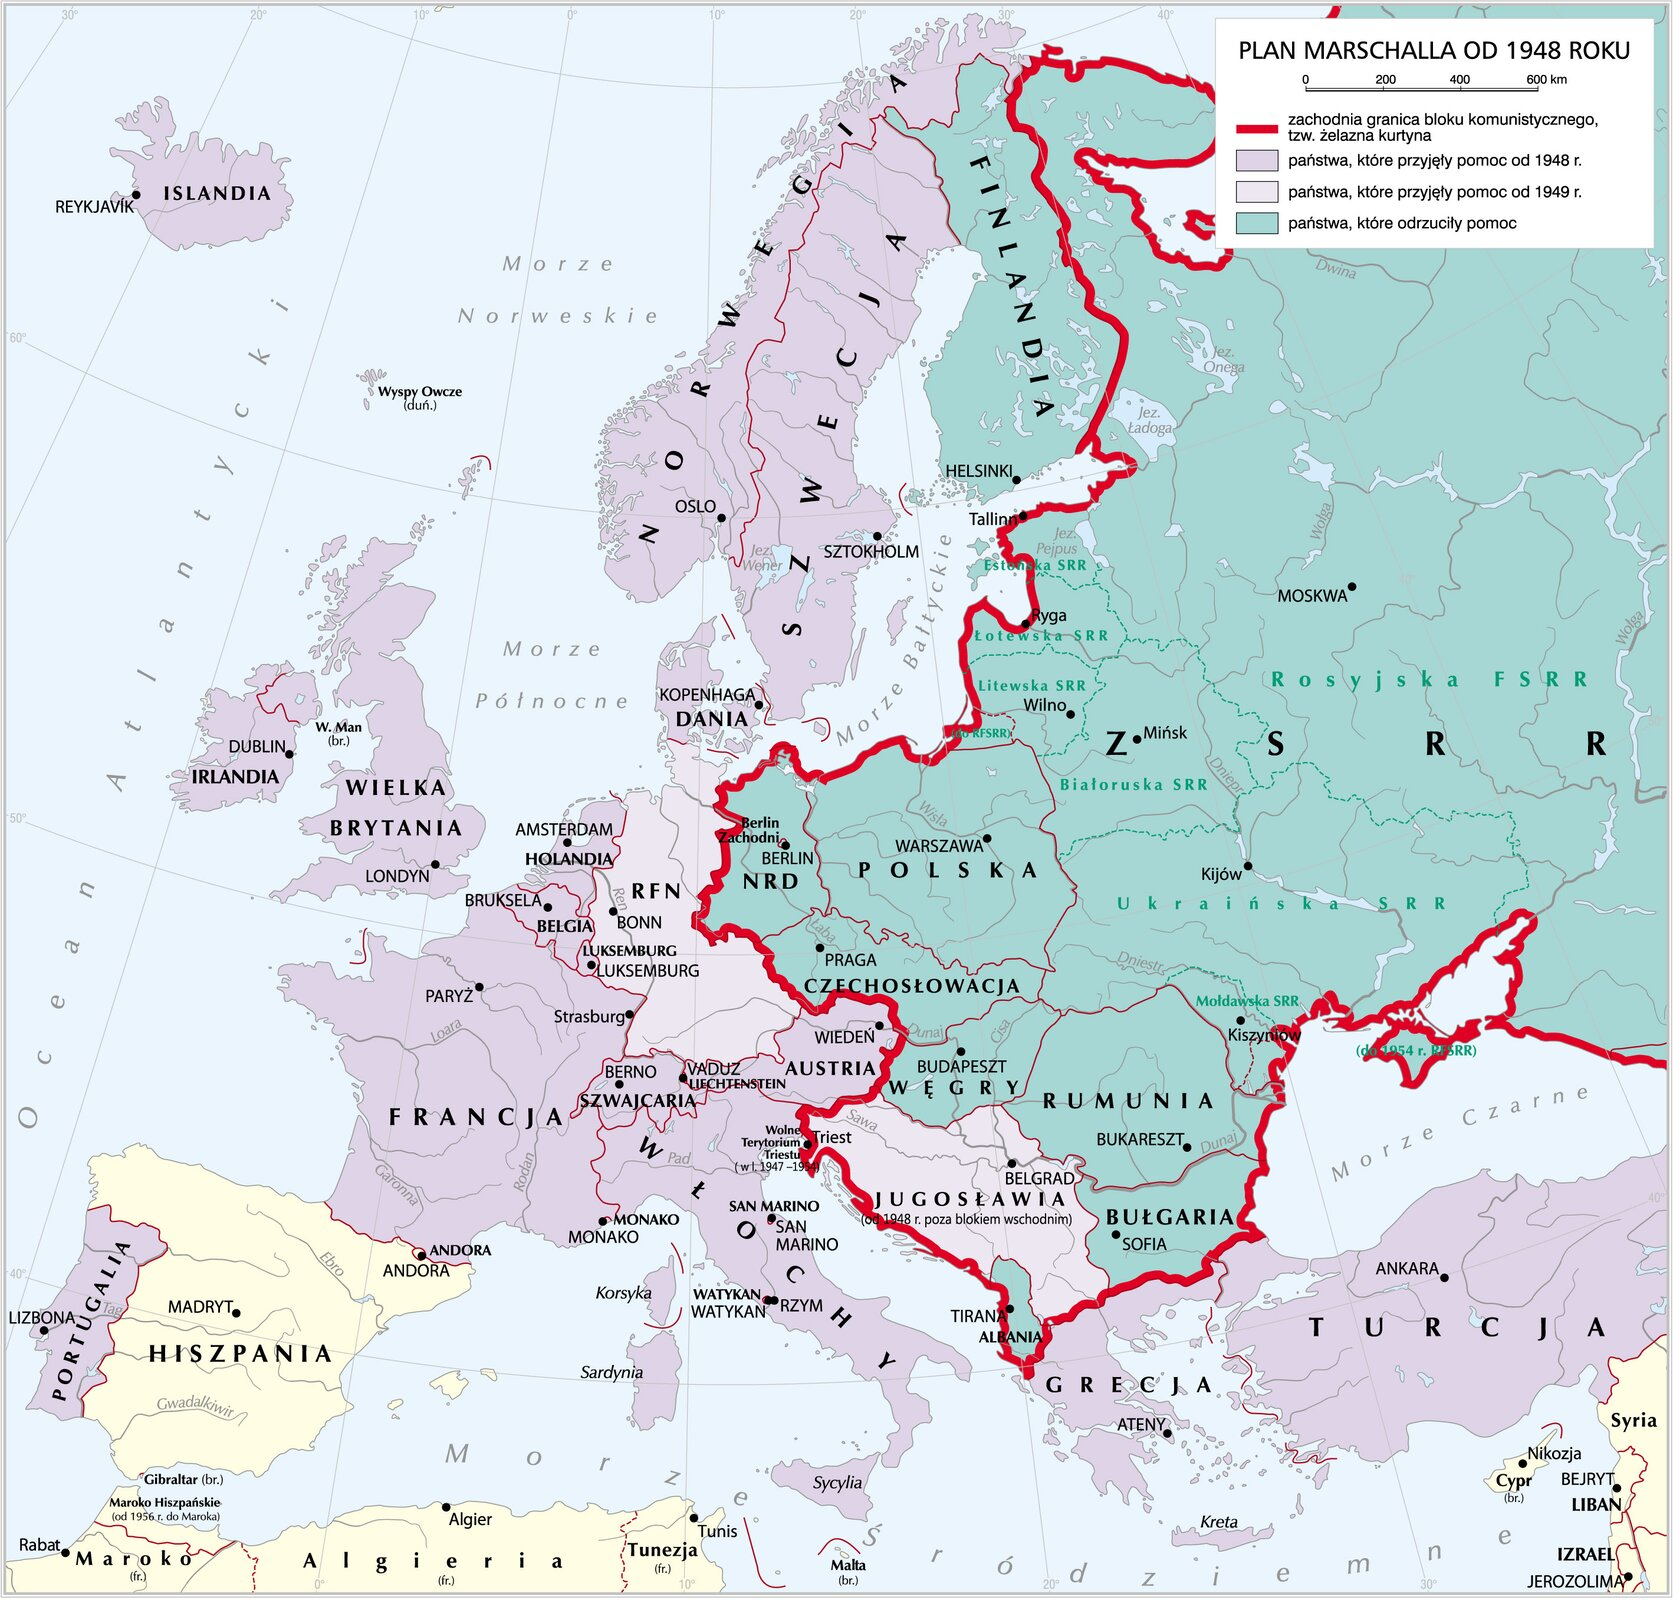 Plan Marschalla Plan Marschalla Źródło: Krystian Chariza izespół, licencja: CC BY 3.0.